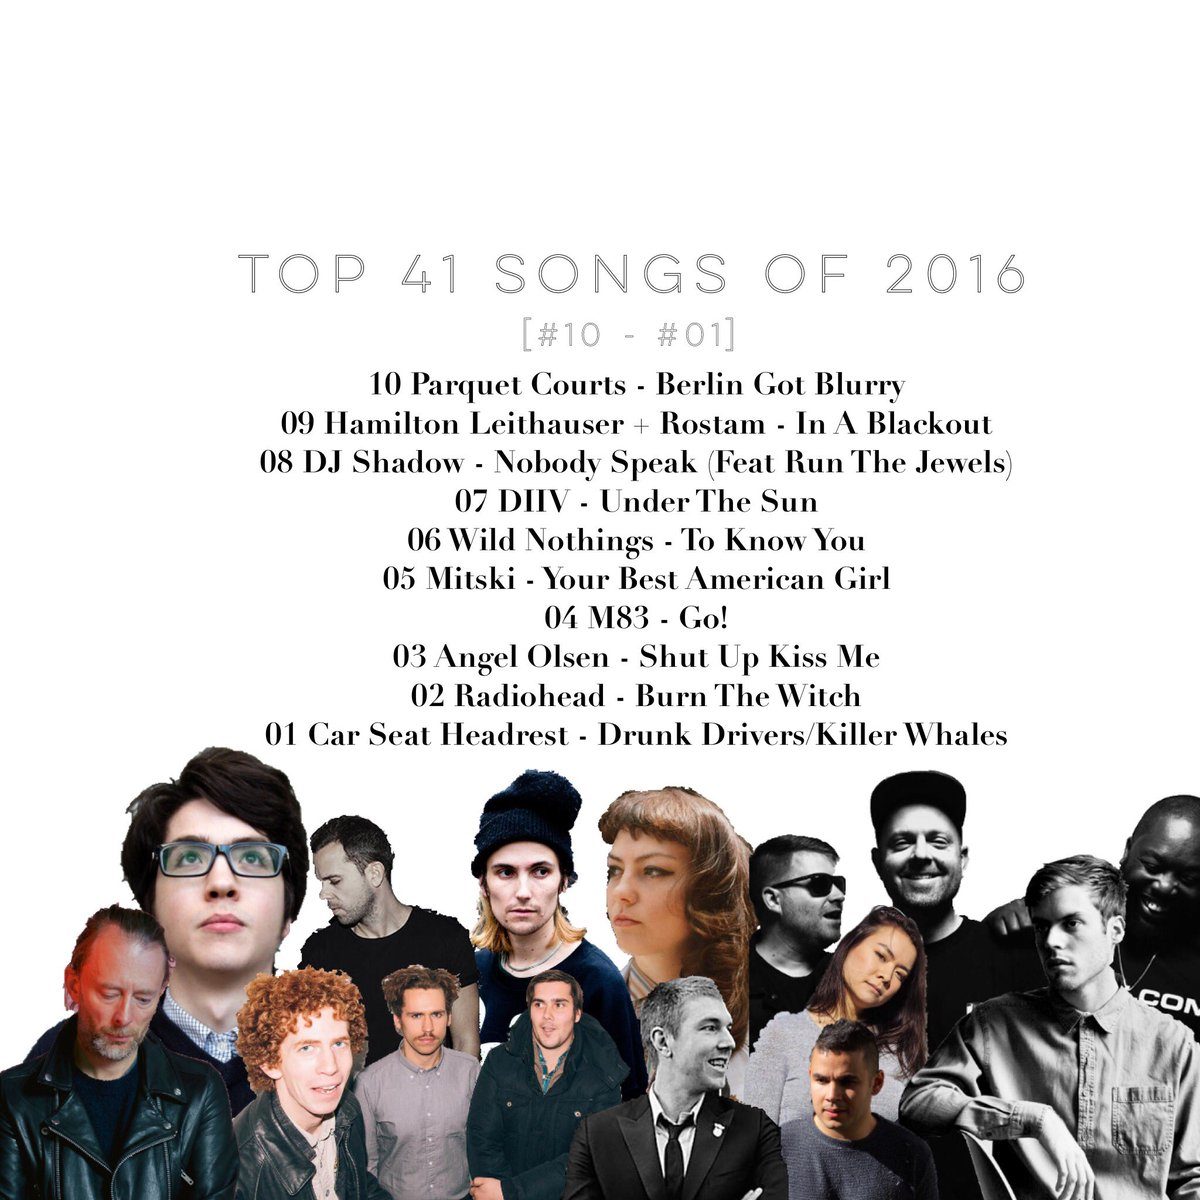 Top 41 Songs of 2016 [#10 - #01] part 4 of 4... https://t.co/ChFpJTIO8b